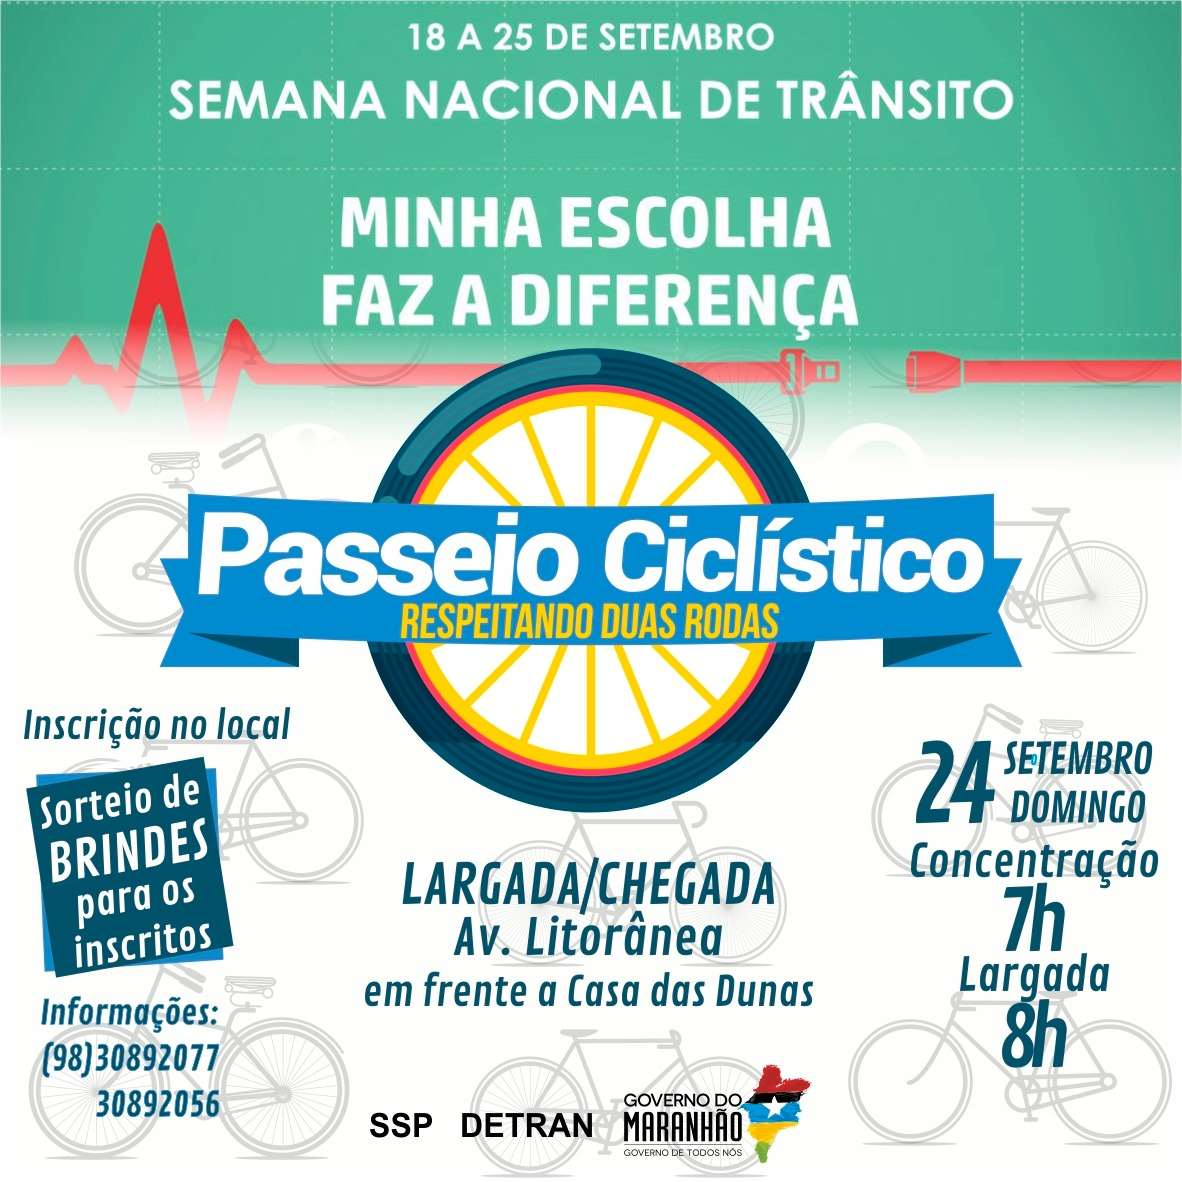 Detran-MA Promove passeio ciclístico na Litorânea